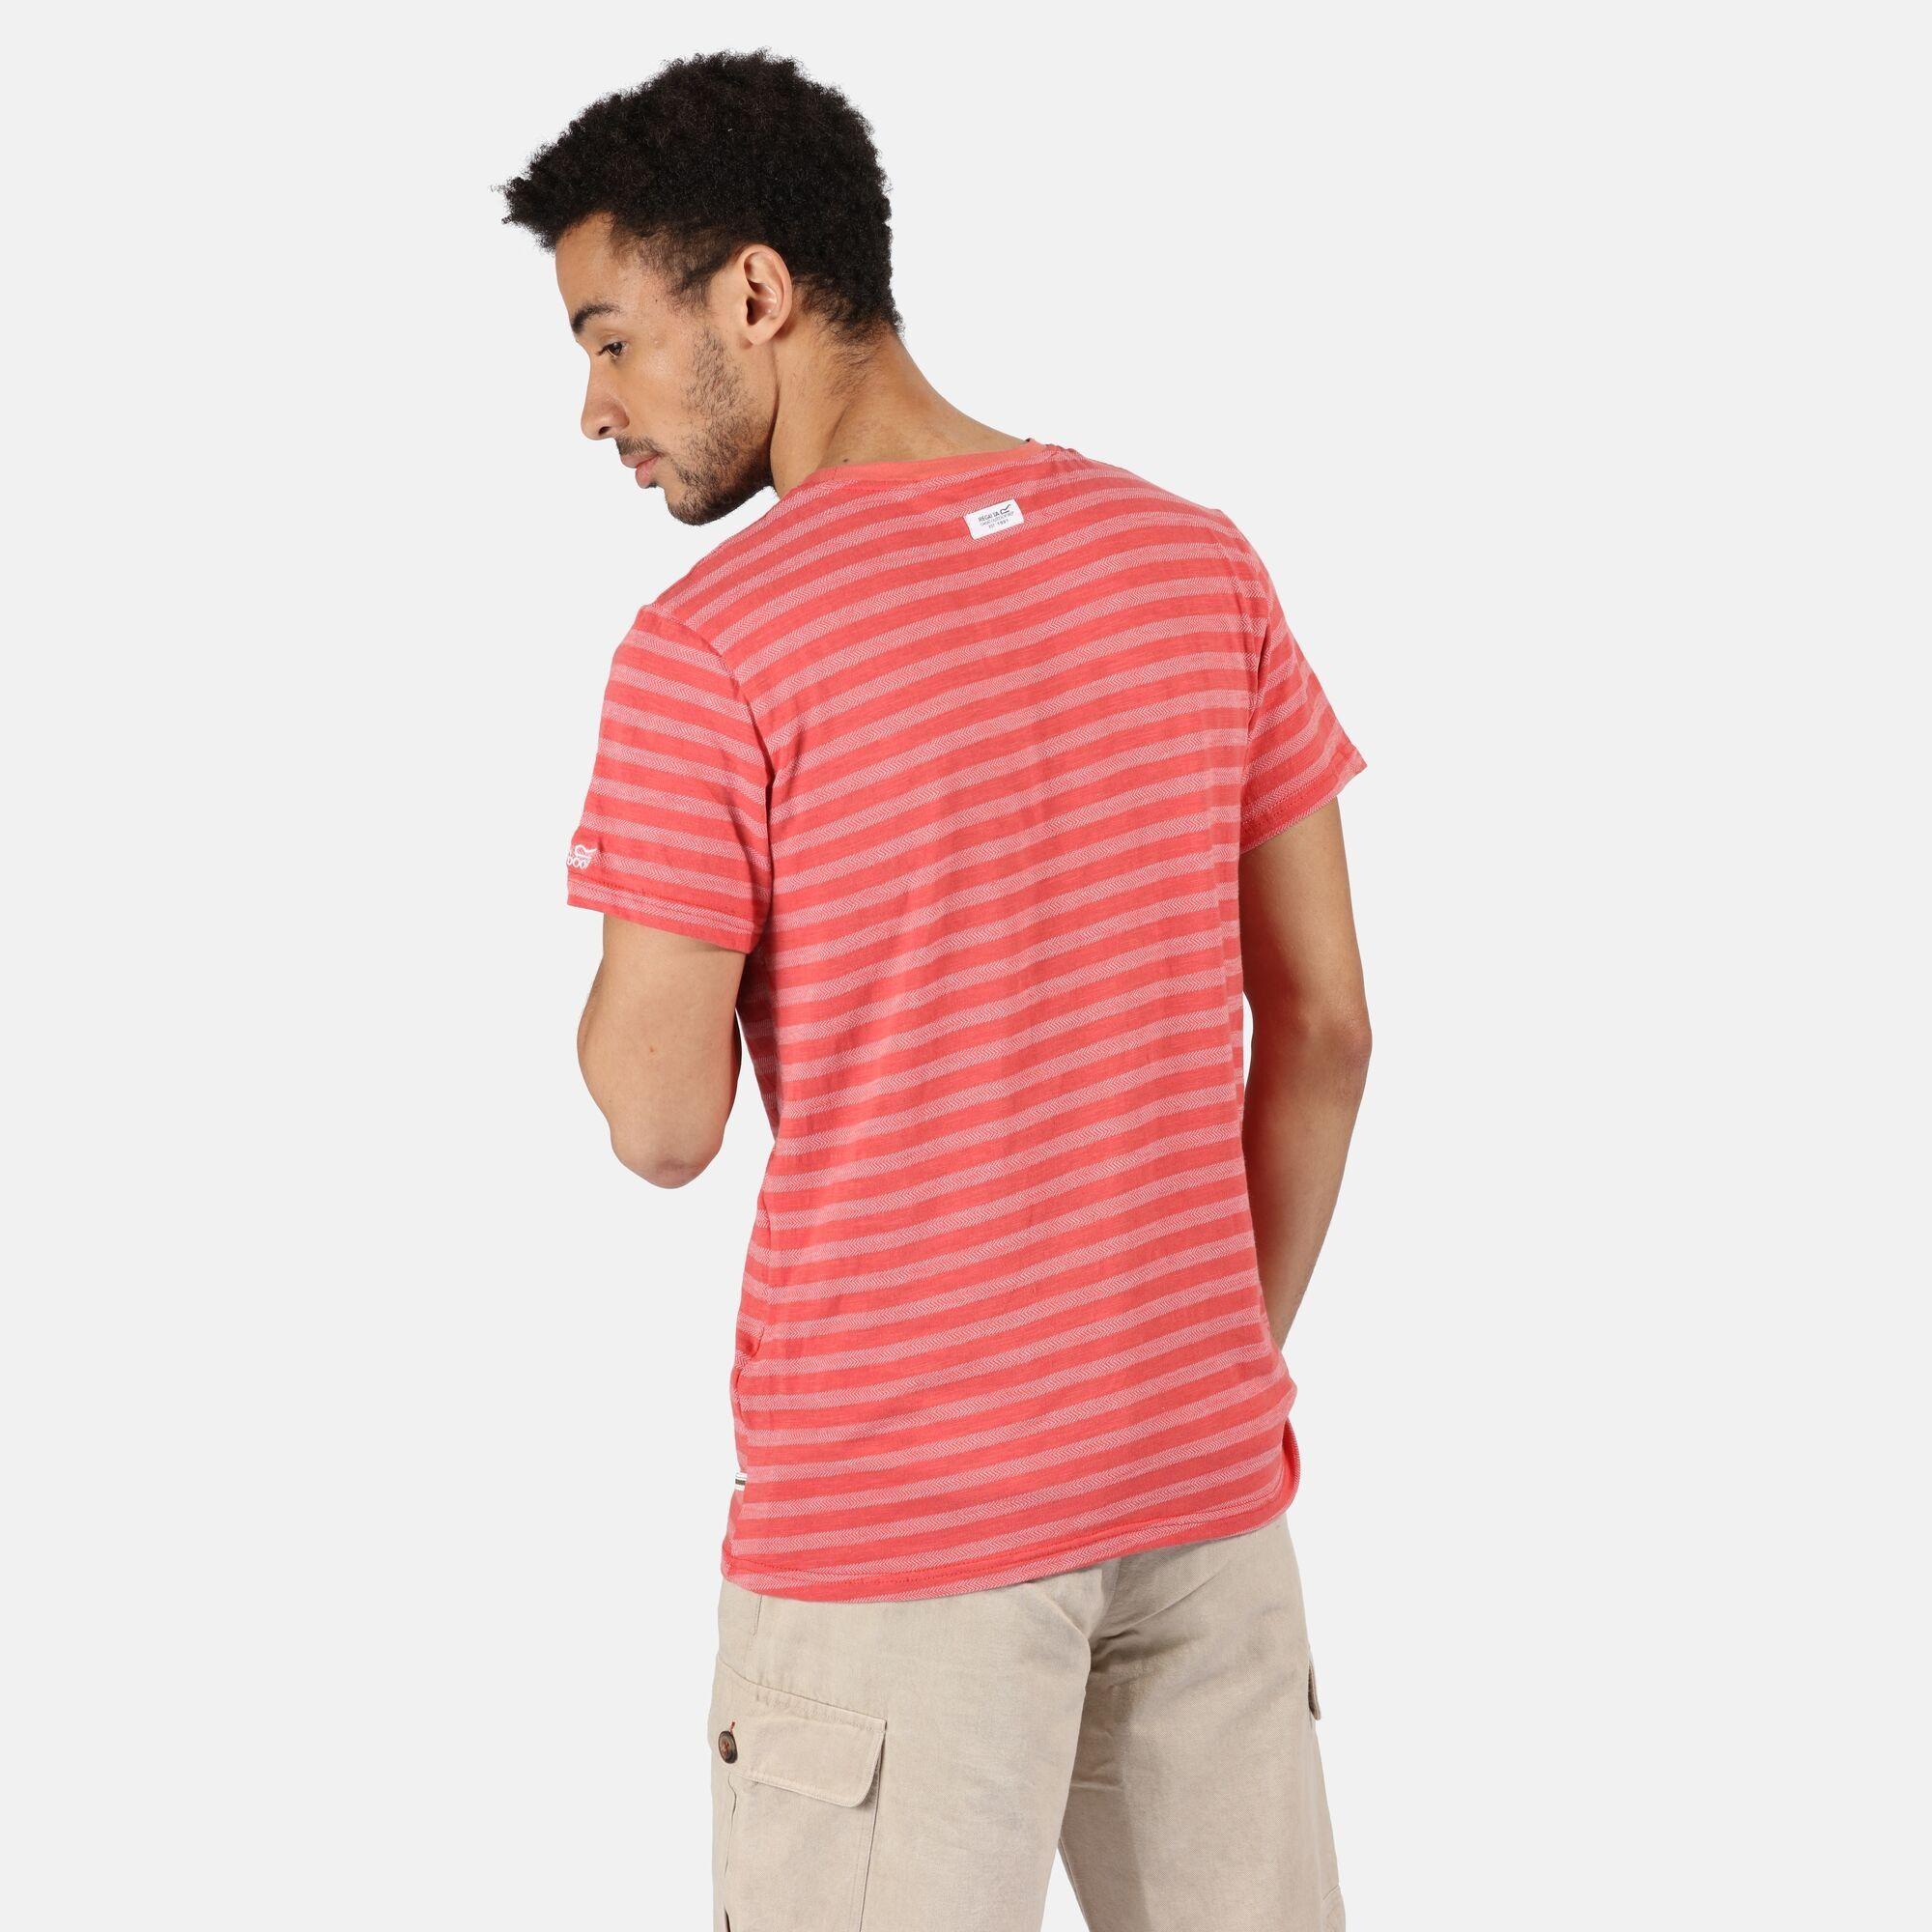 Regatta Mens Tariq Striped T-Shirt